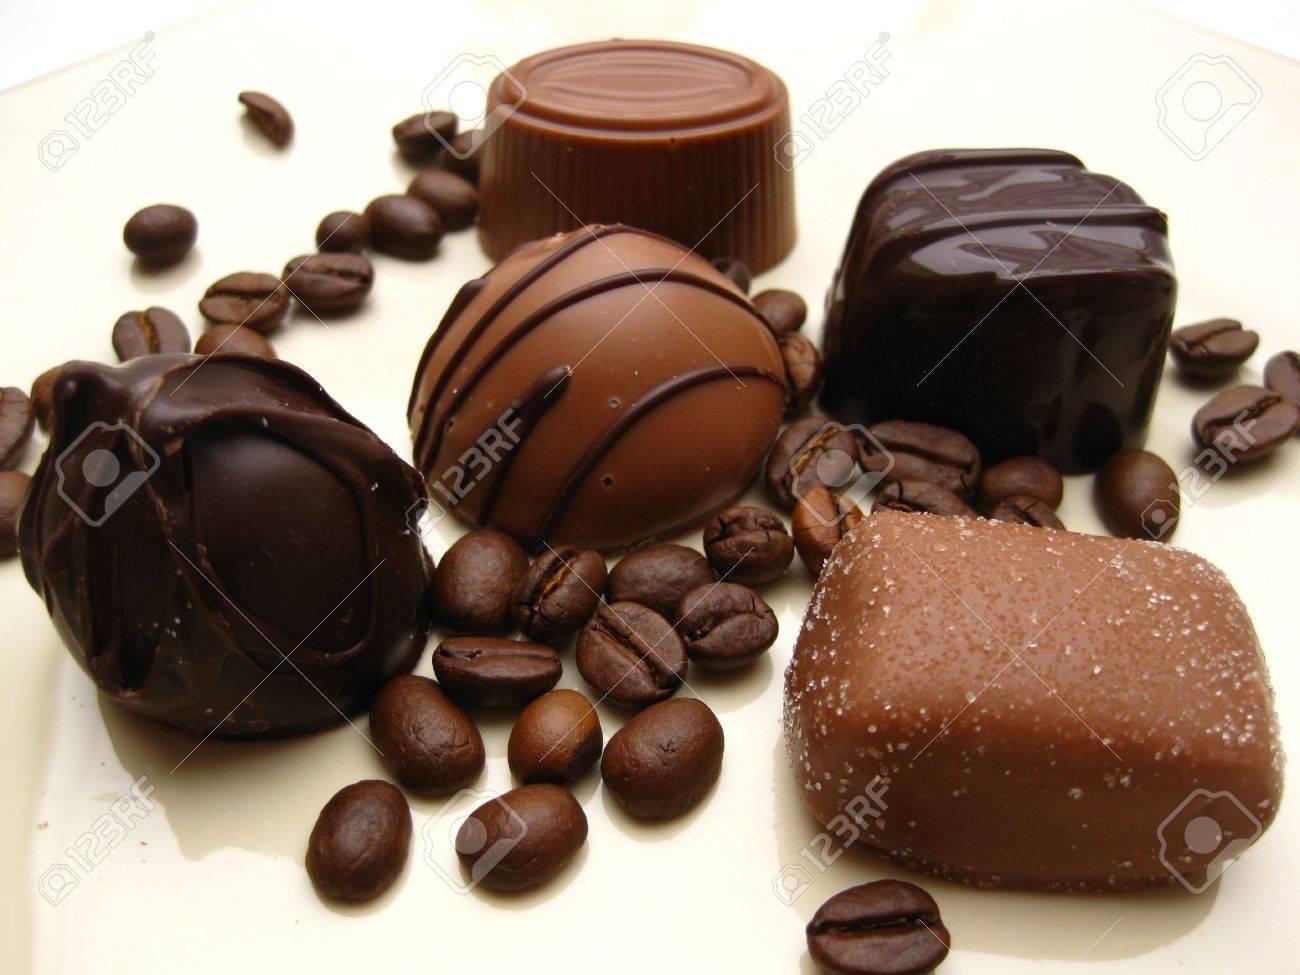 belgium chocolate pralines with coffee beans Stock Photo - 4680826